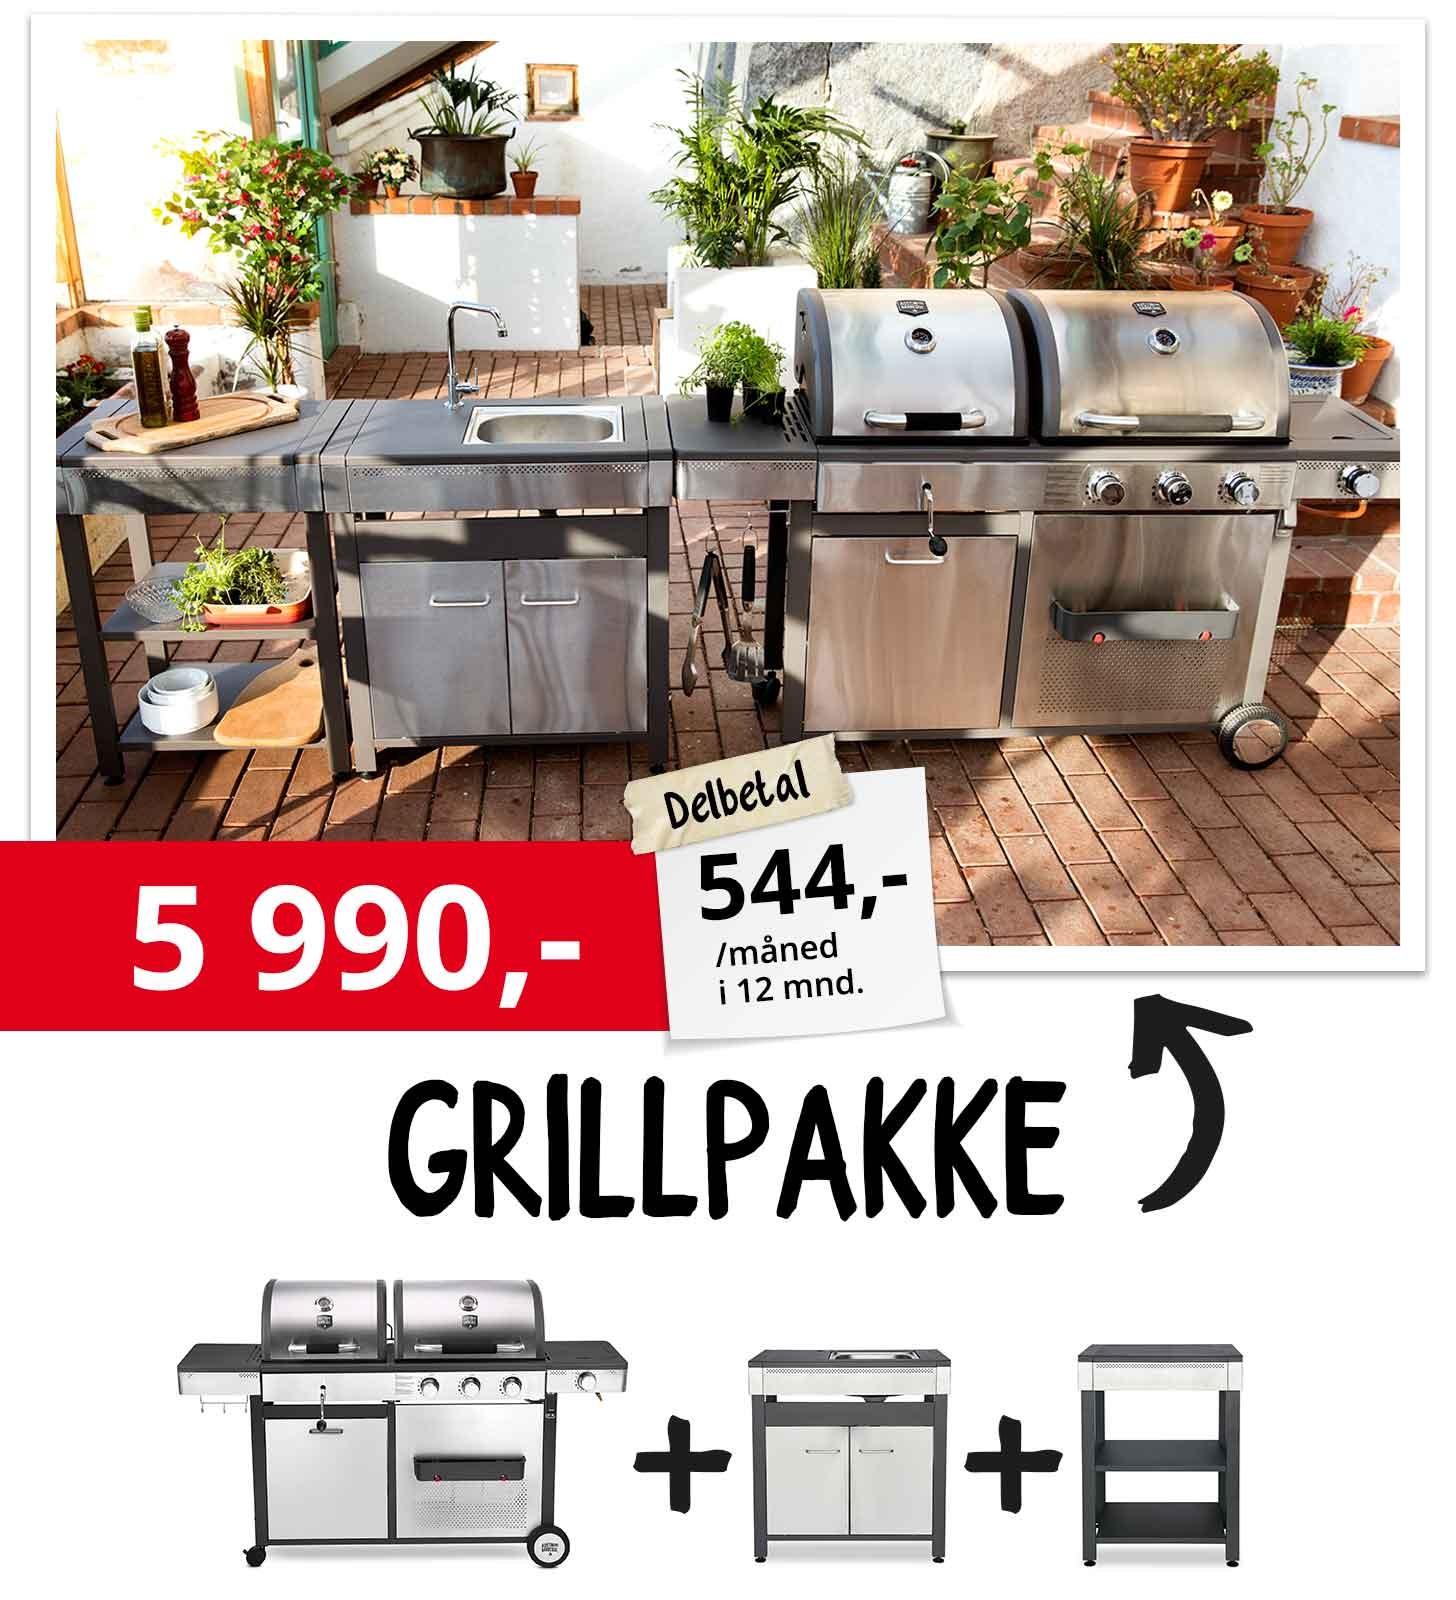 Grillpakke 6990,-